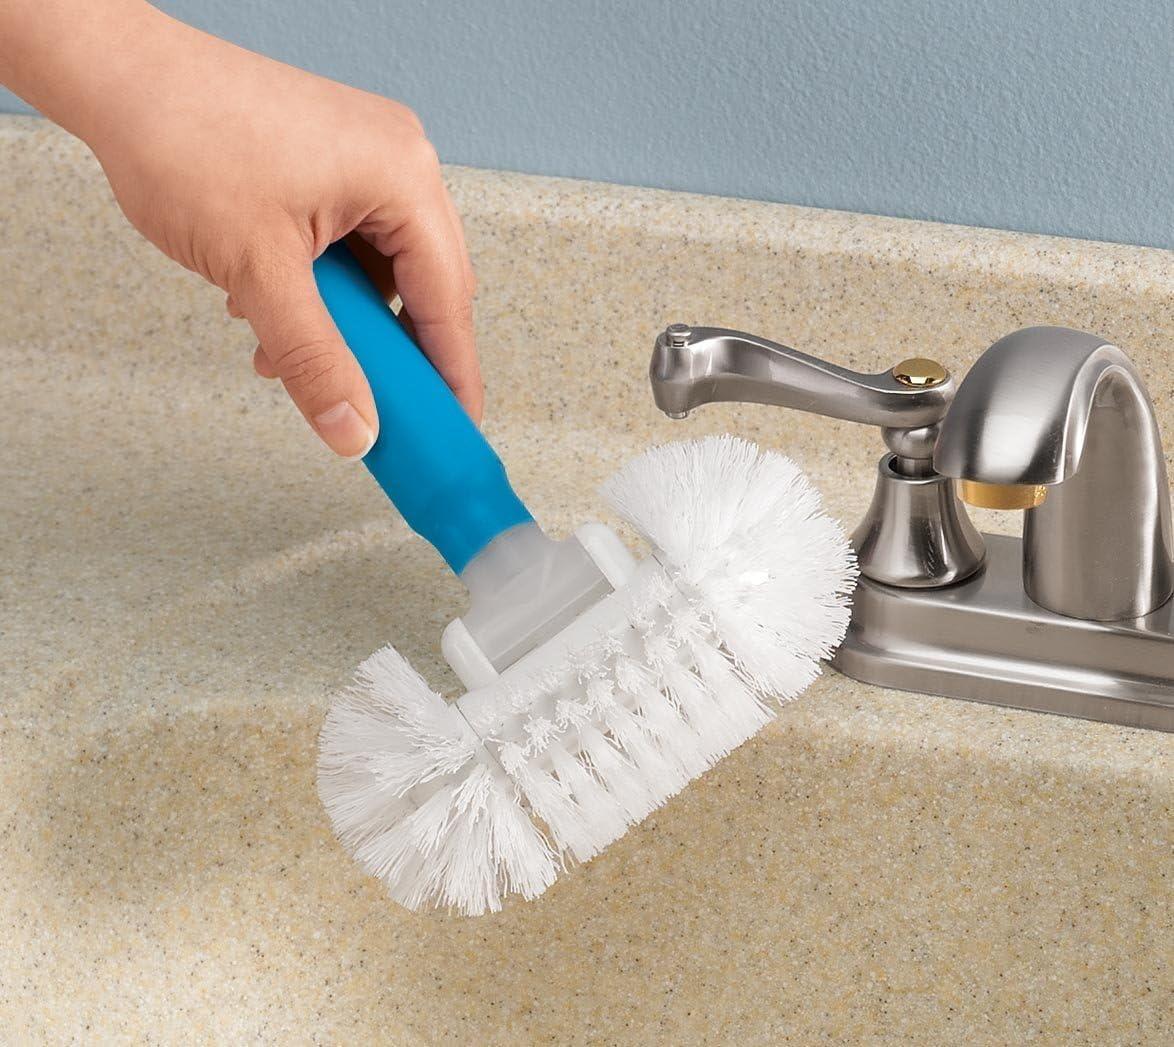 Dynamovolition Retractable Aluminum Rod Long Handle Brush Bathroom Cleaning Brush Bathtub Toilet Tile Brush Home Floor Brush